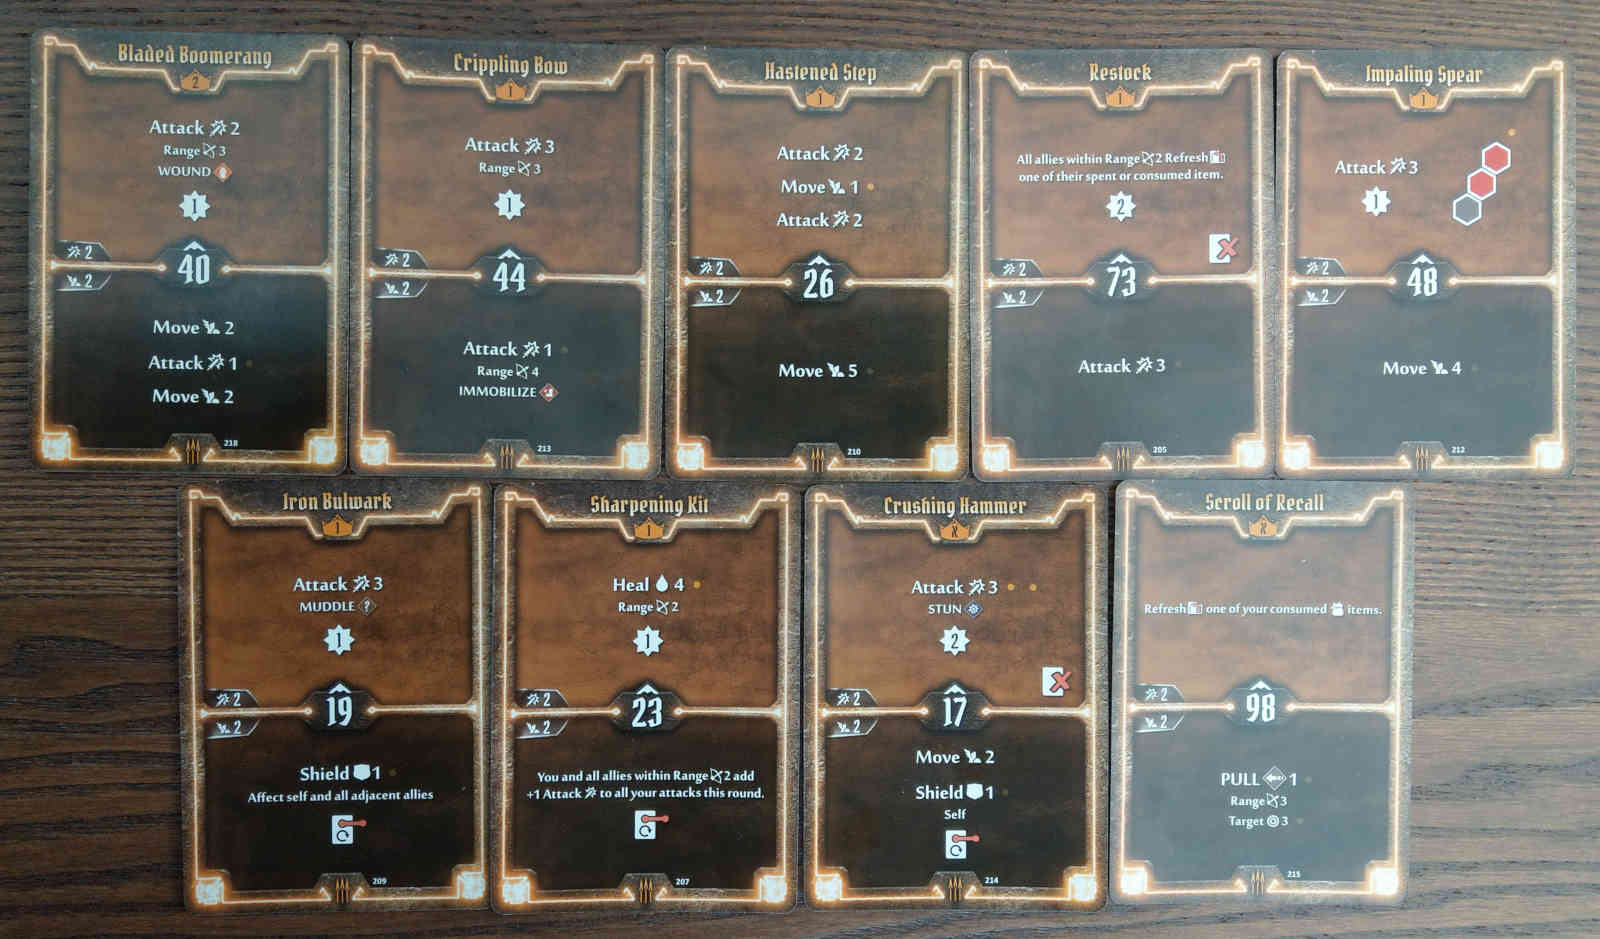 Level 2 Quartermaster deck cards